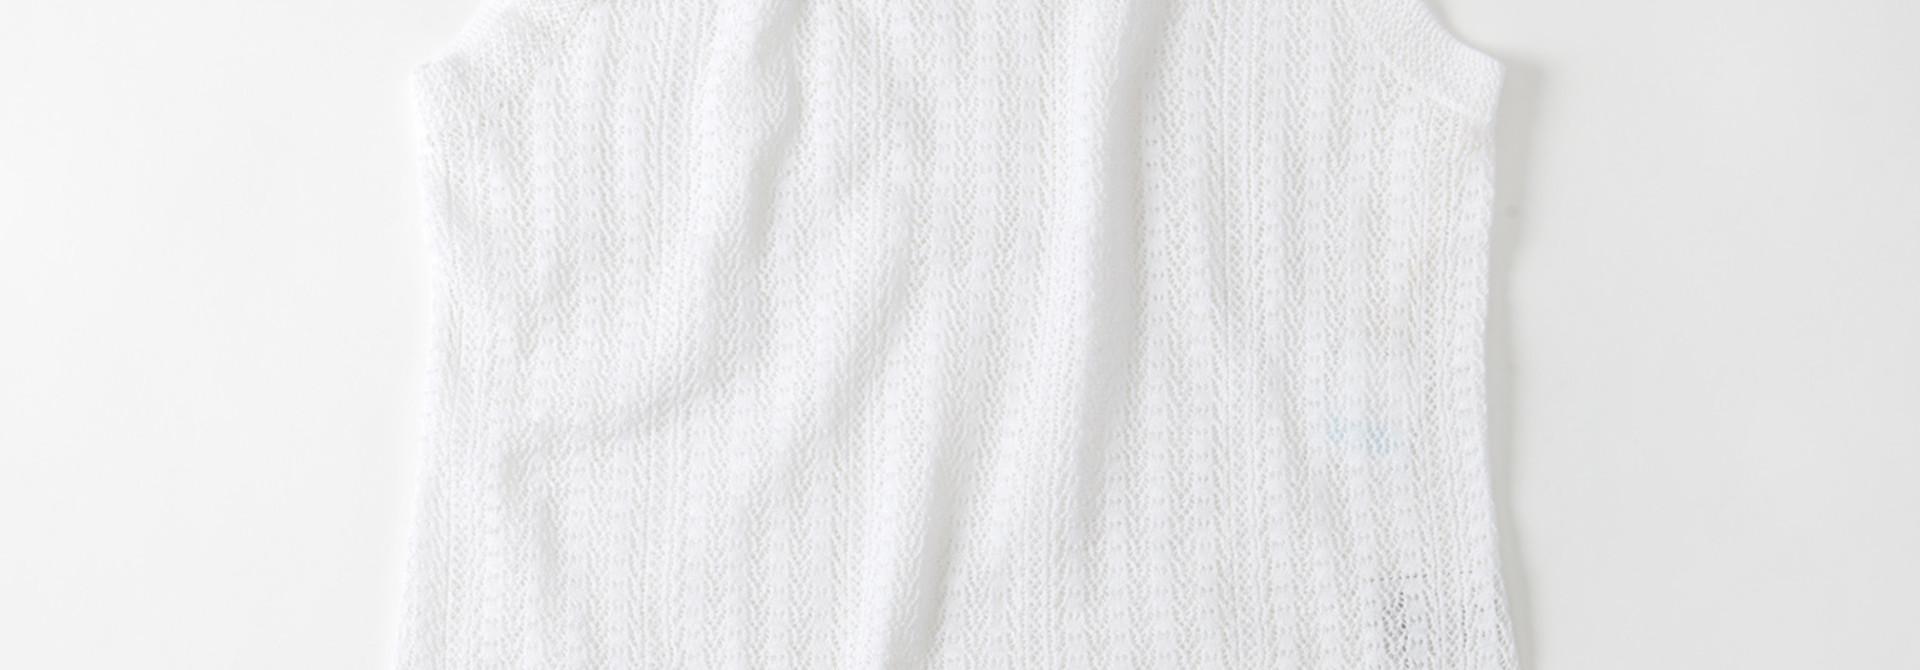 WH Gima Knit Lace Sleeveless Top